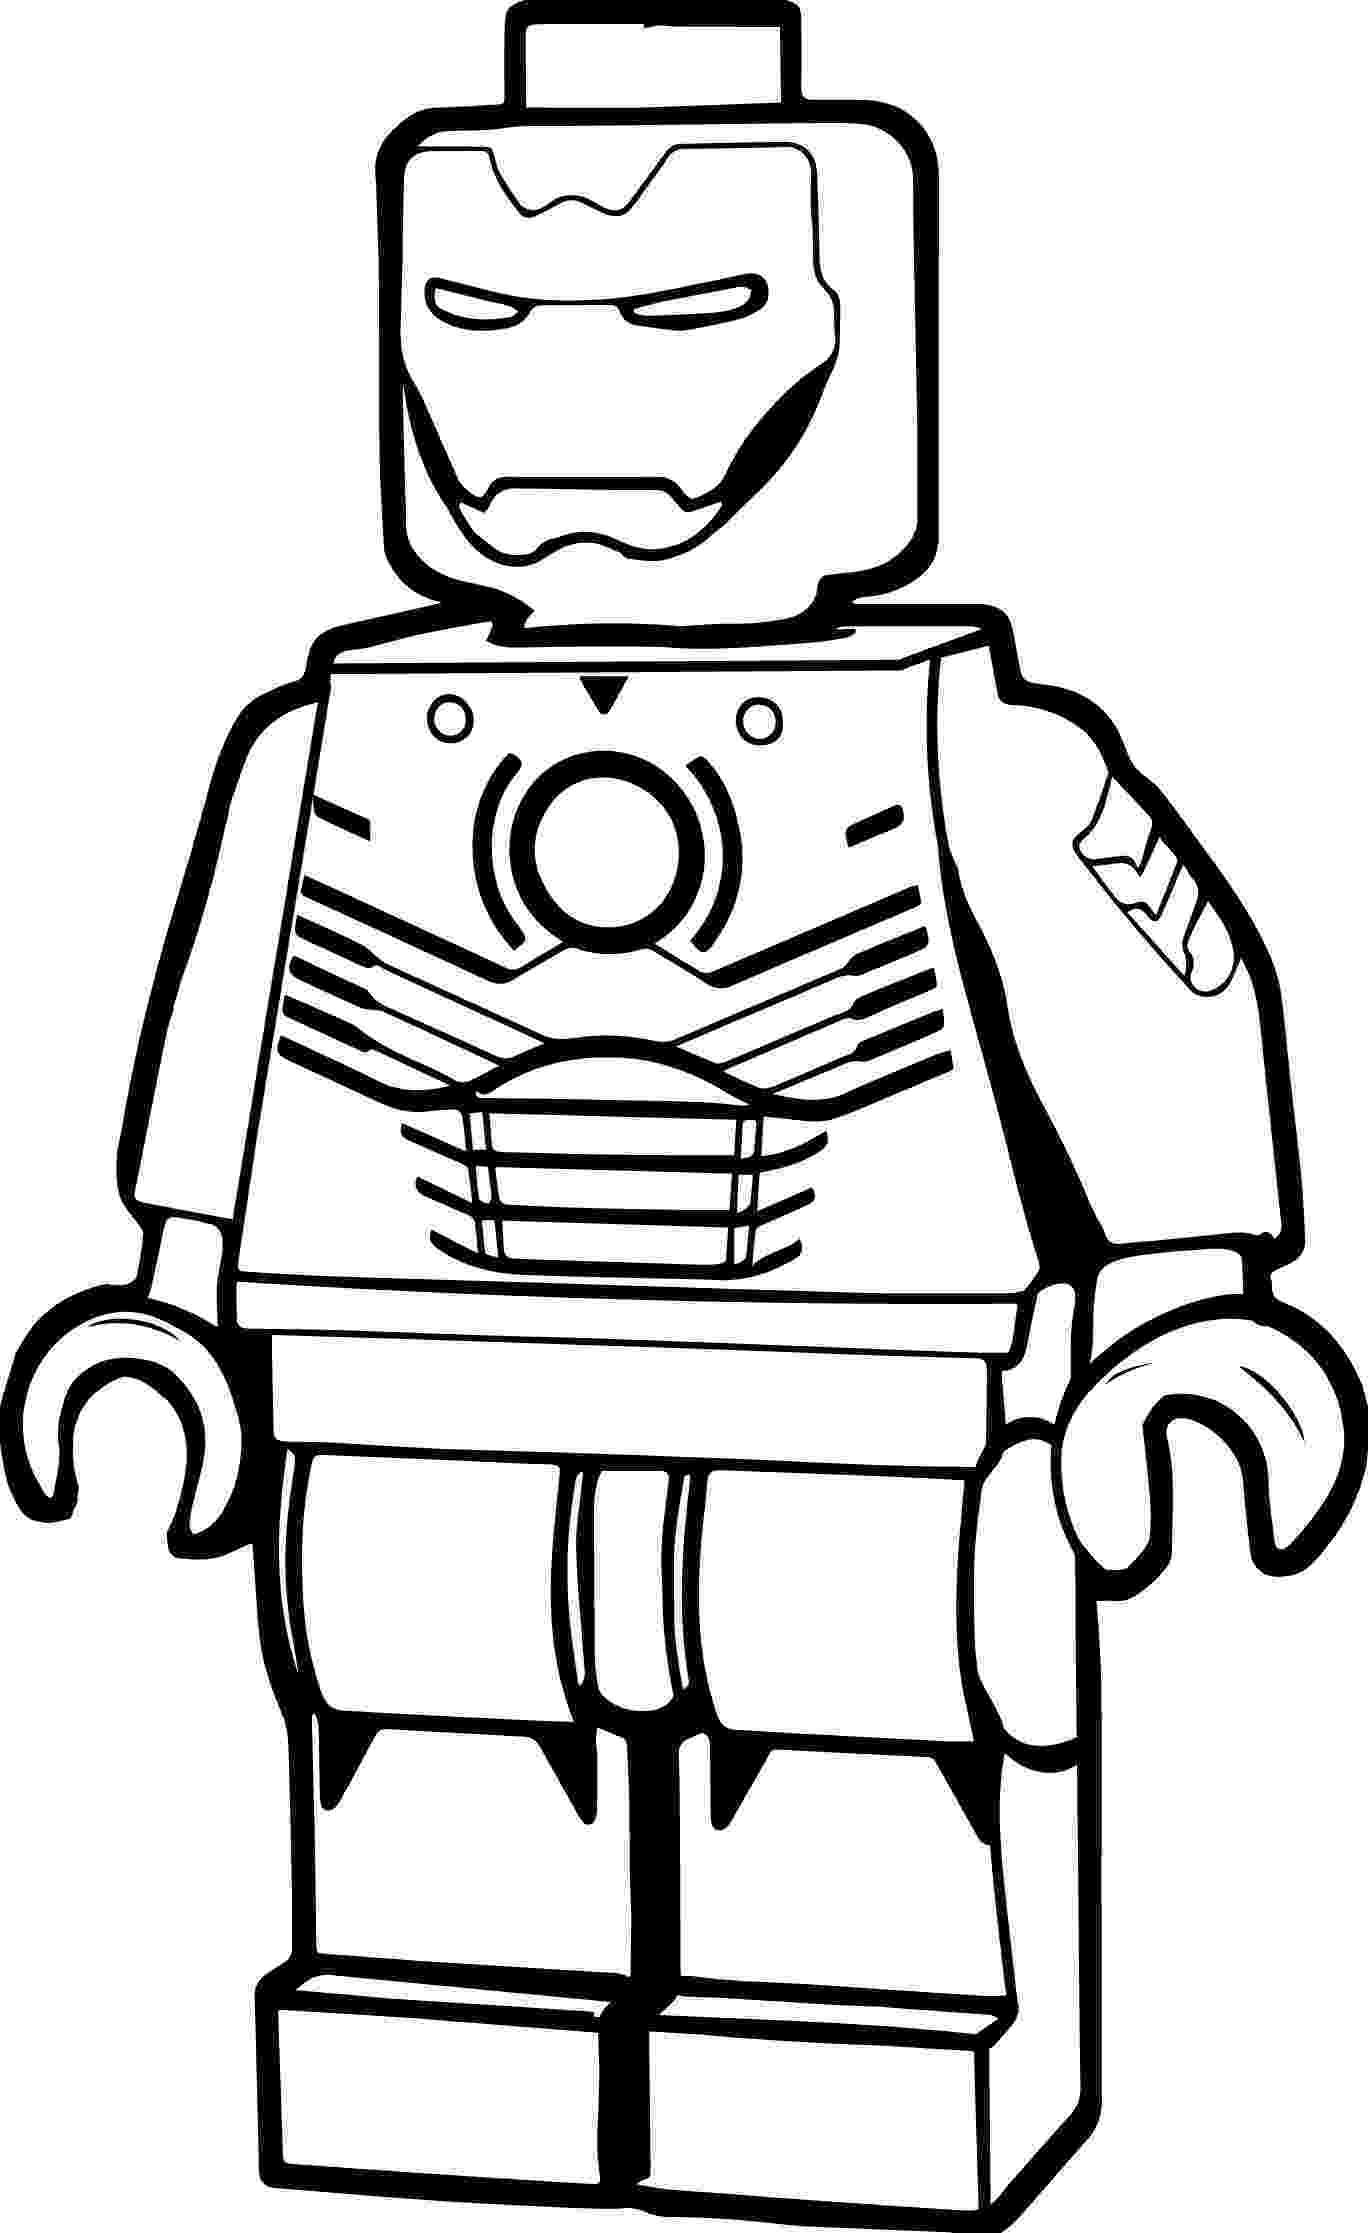 lego man printable lego batman coloring pages best coloring pages for kids man lego printable